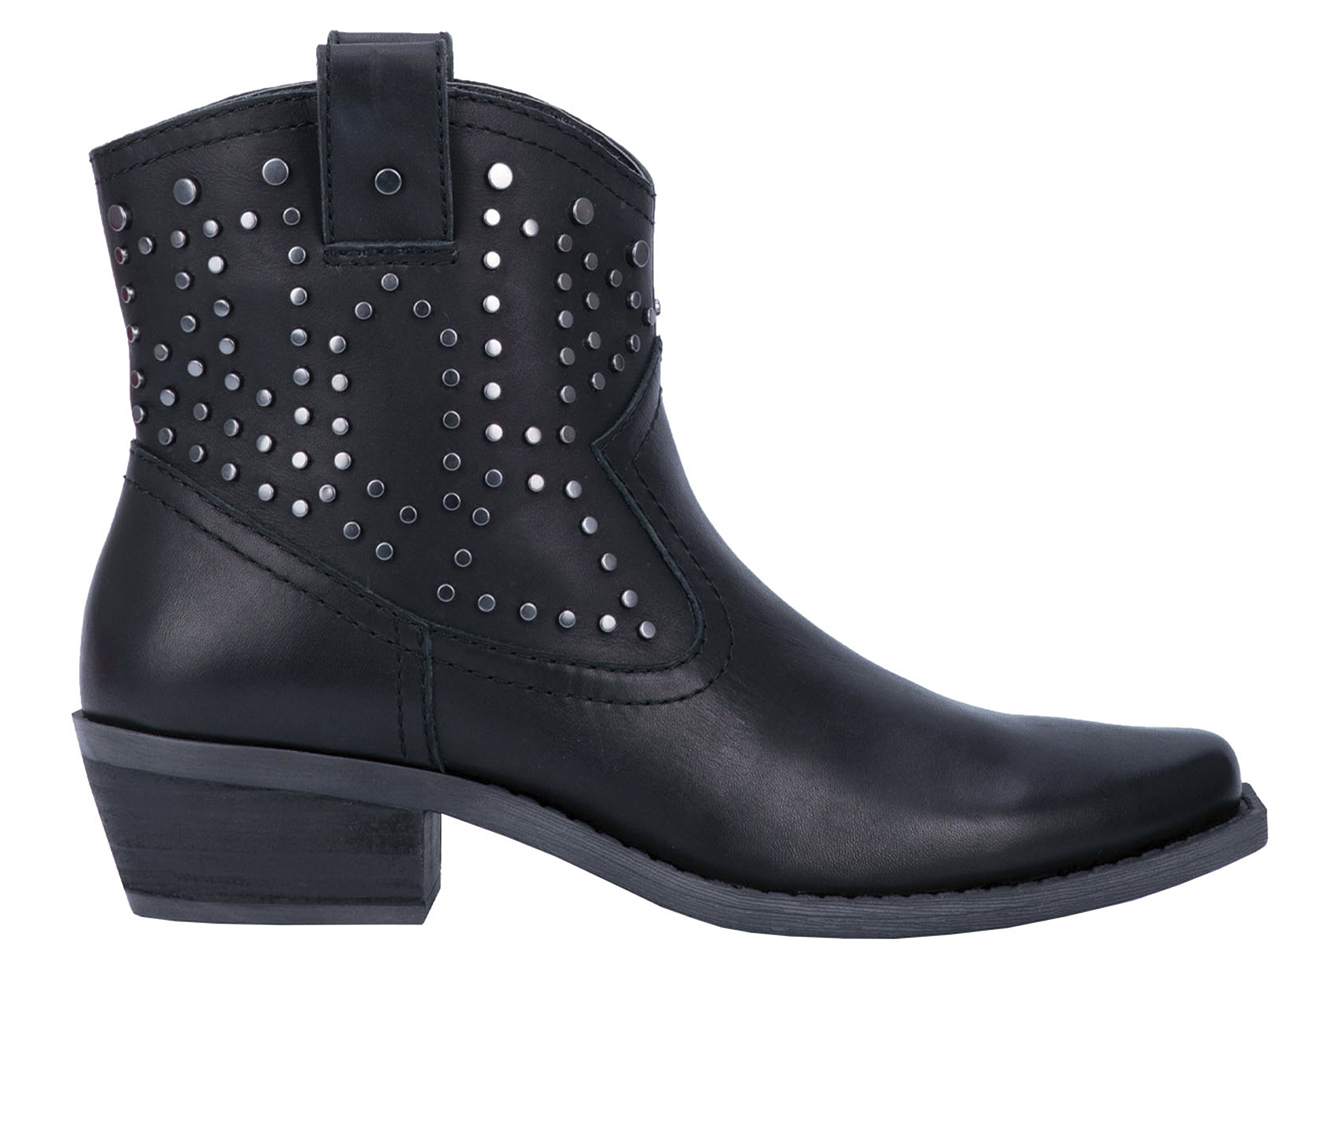 Dingo Boots Dusty Women's Boots (Black - Leather)